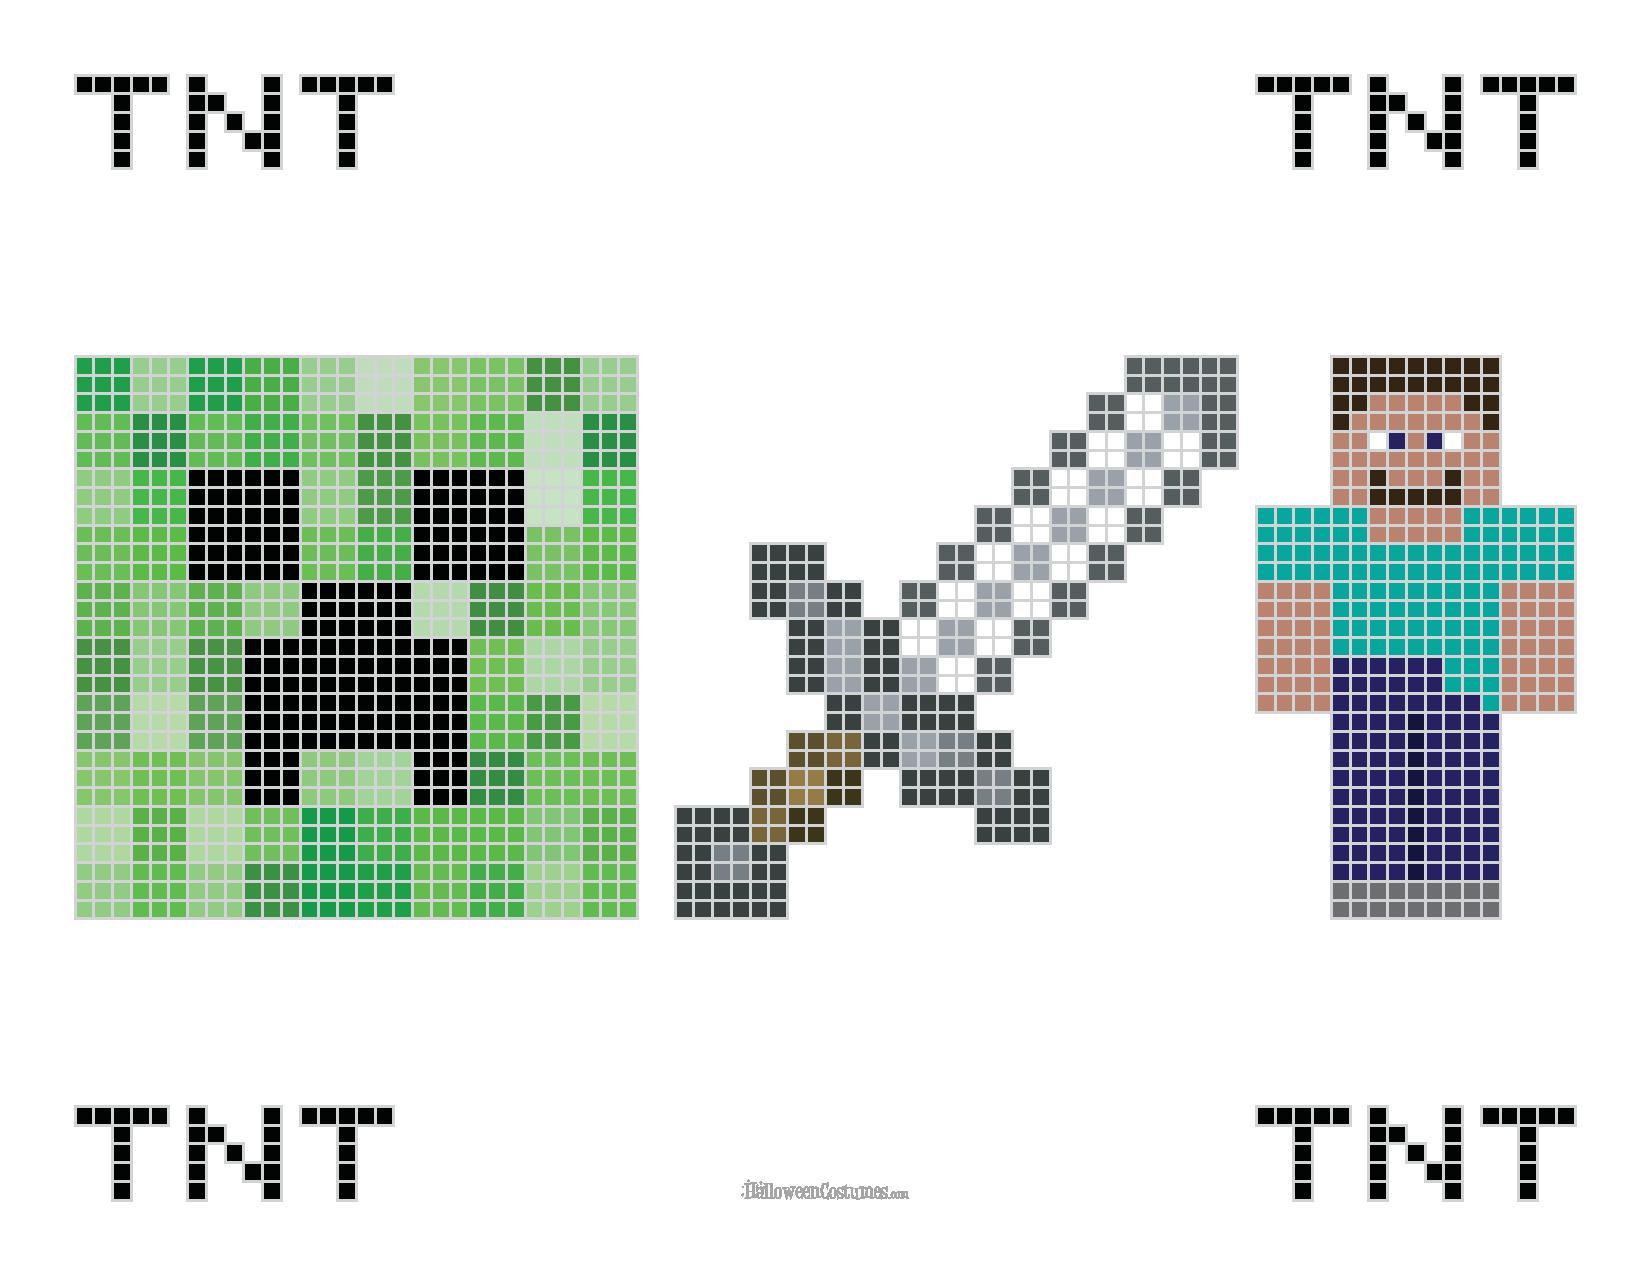 Minecraft Cross Stitch Pattern